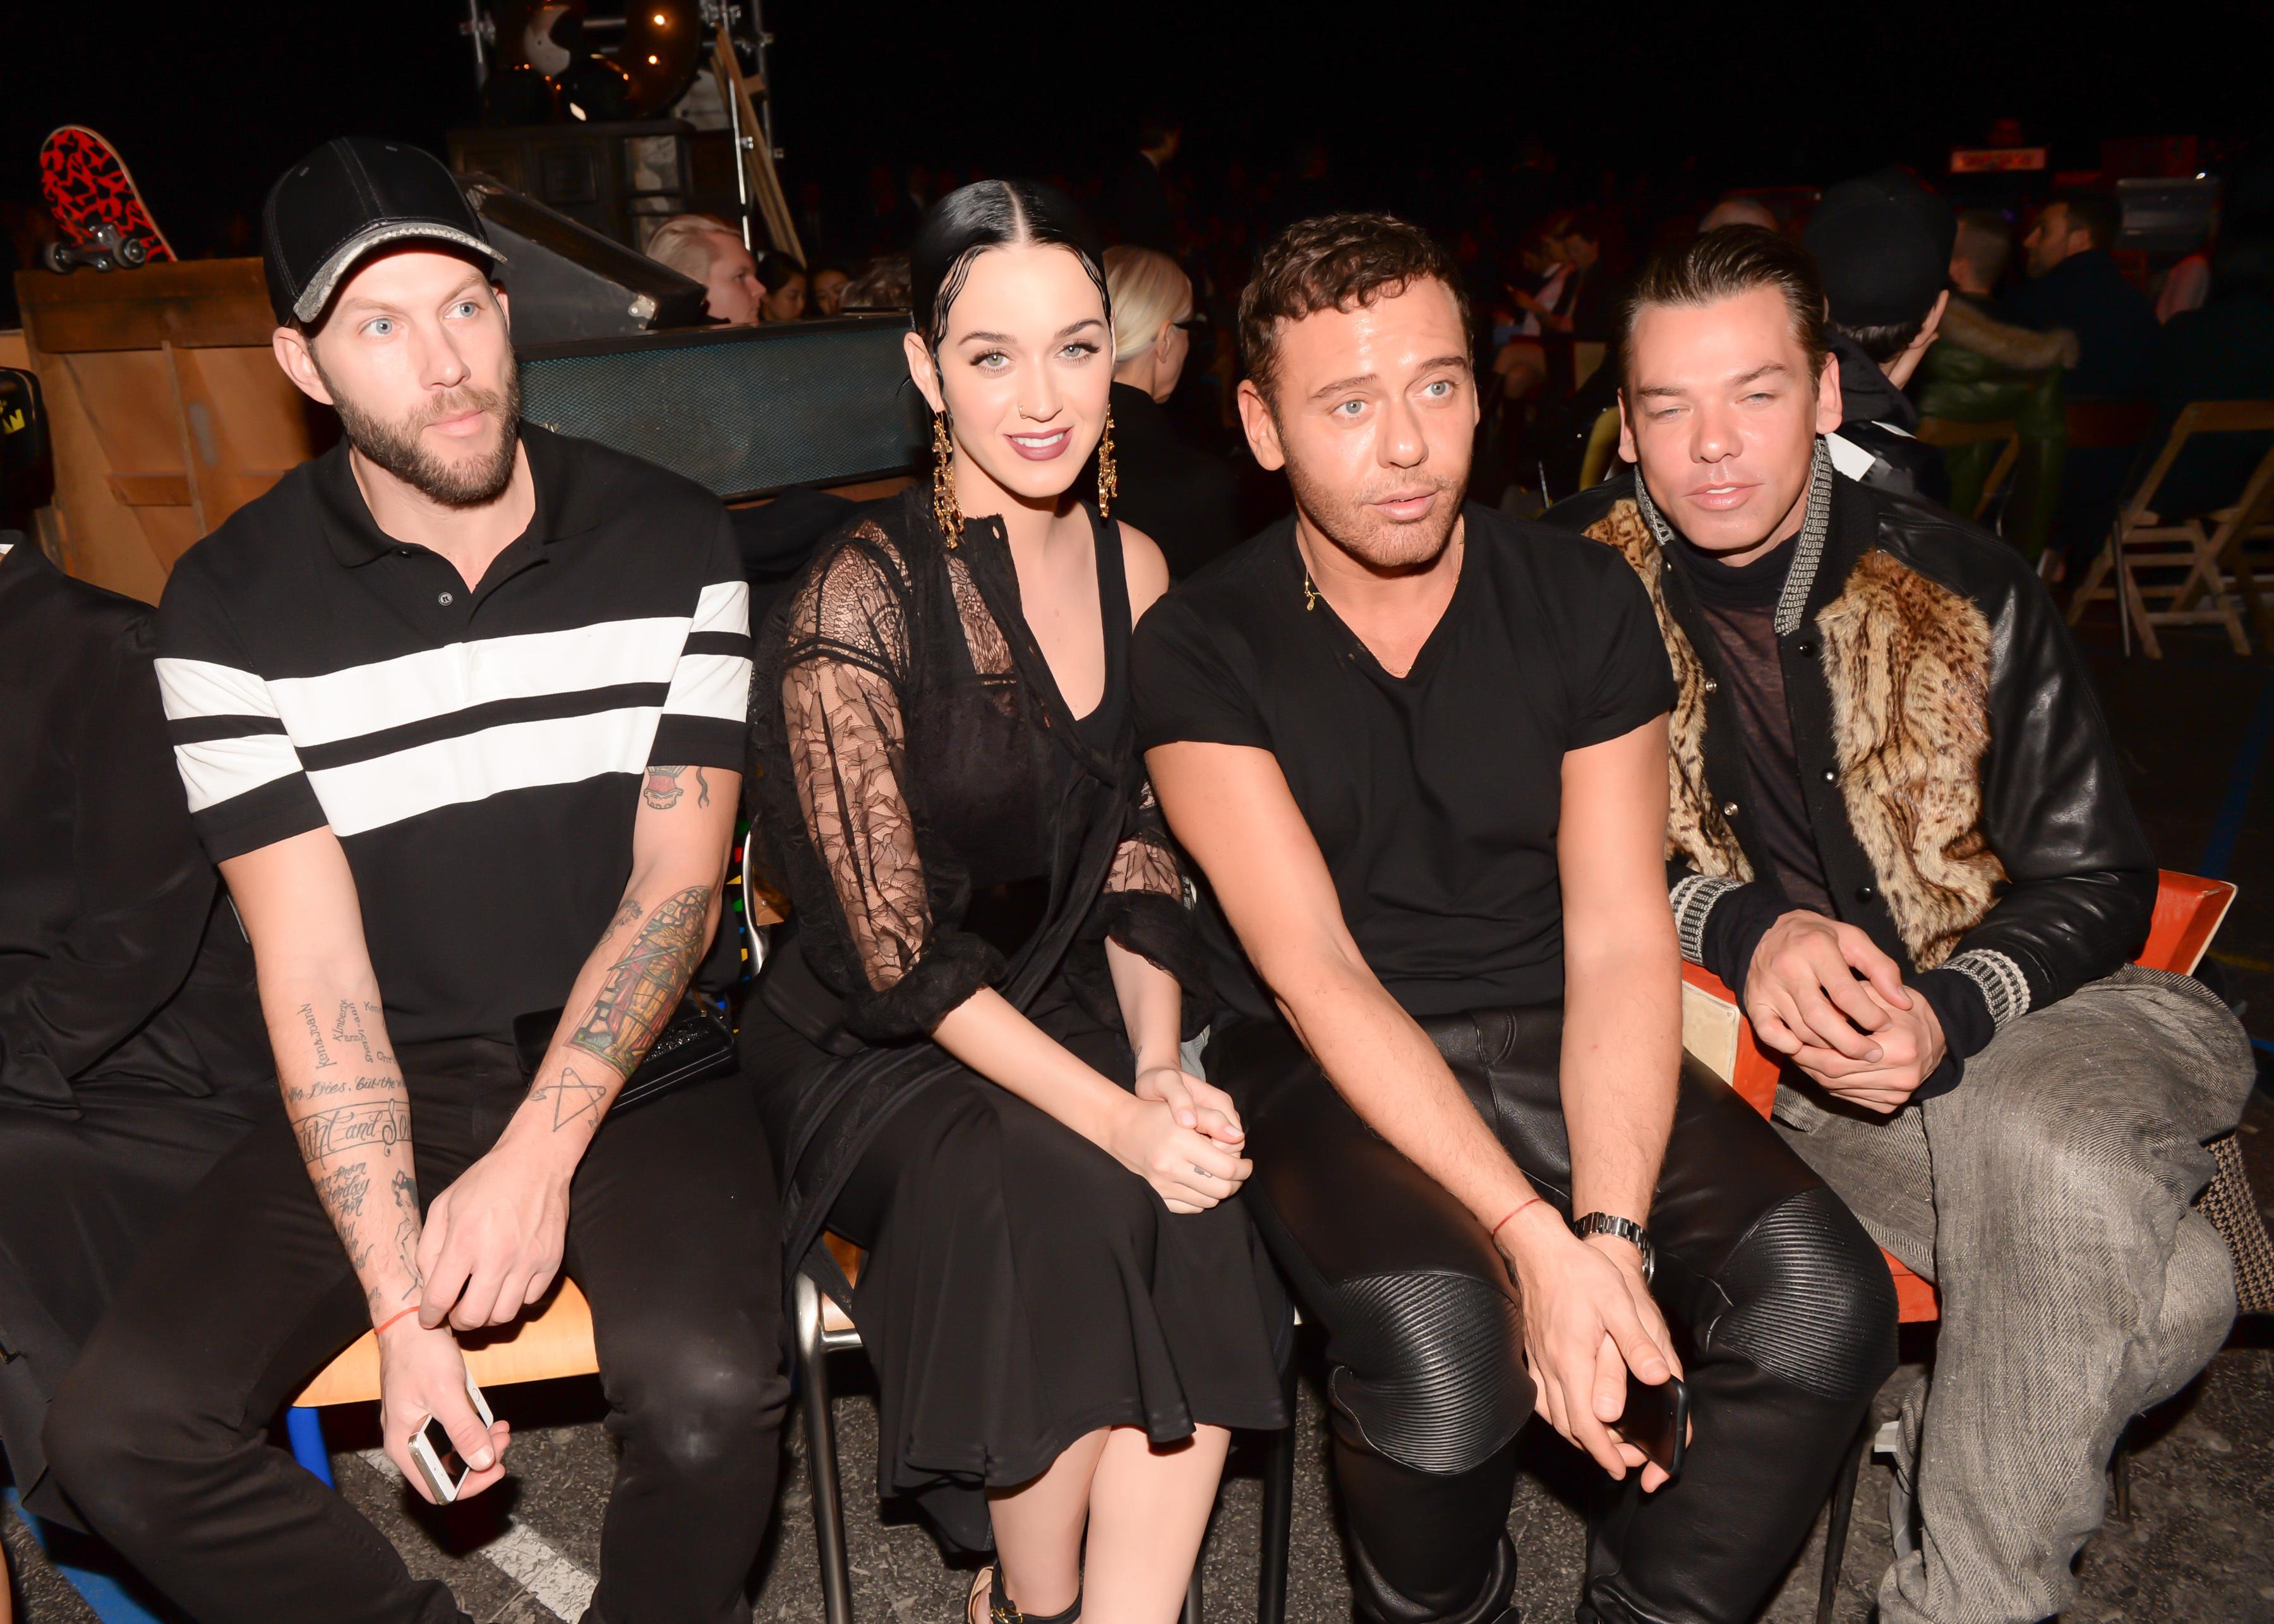 Johnny Wujek, Katy Perry, Mert Alas and Marcus Piggott (Photo: BFA).